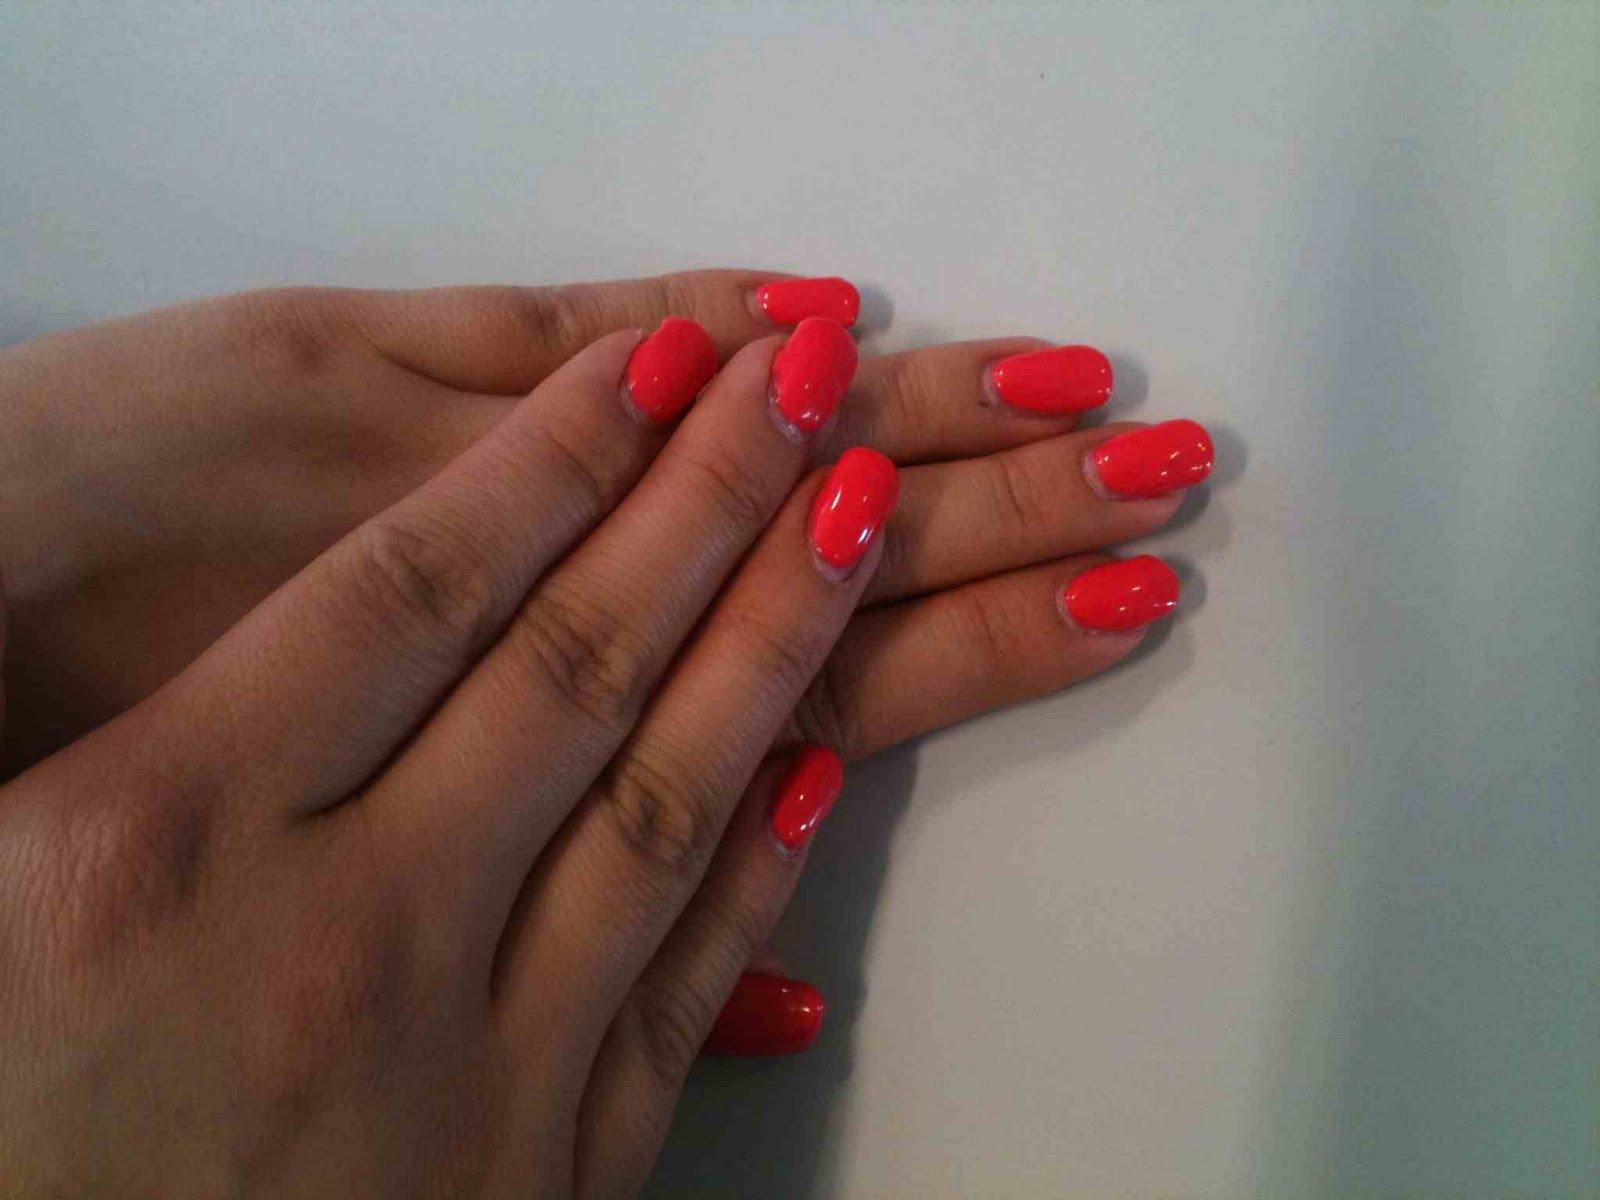 Patience Ltd.: Shellac Gel nails